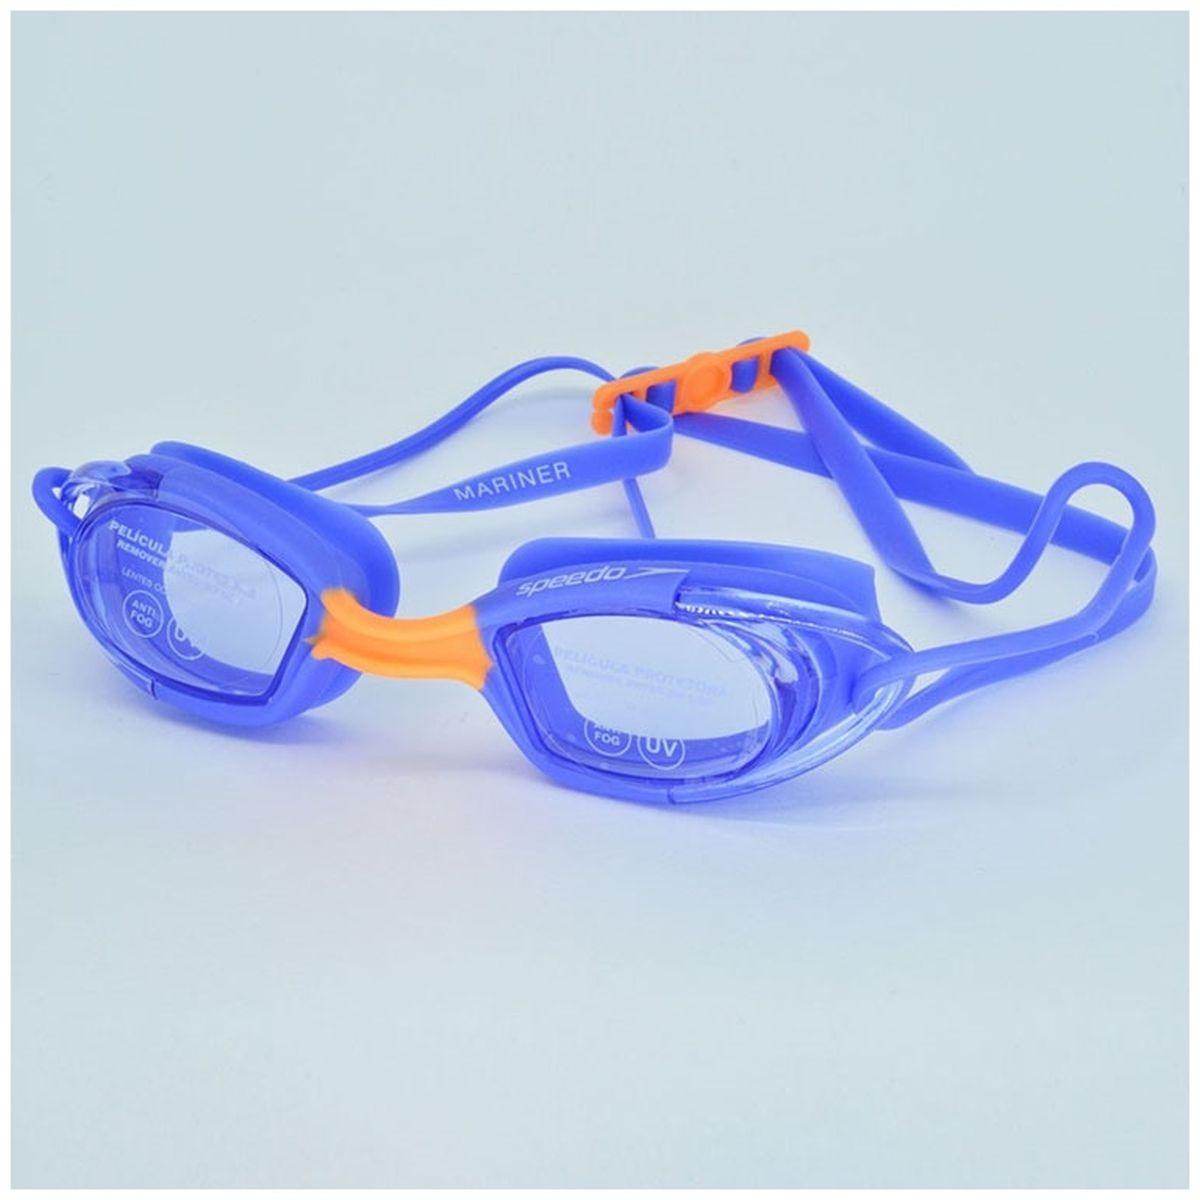 93fbb7b3828f3 Óculos Mariner Speedo 509081 - R  50,82 em Mercado Livre